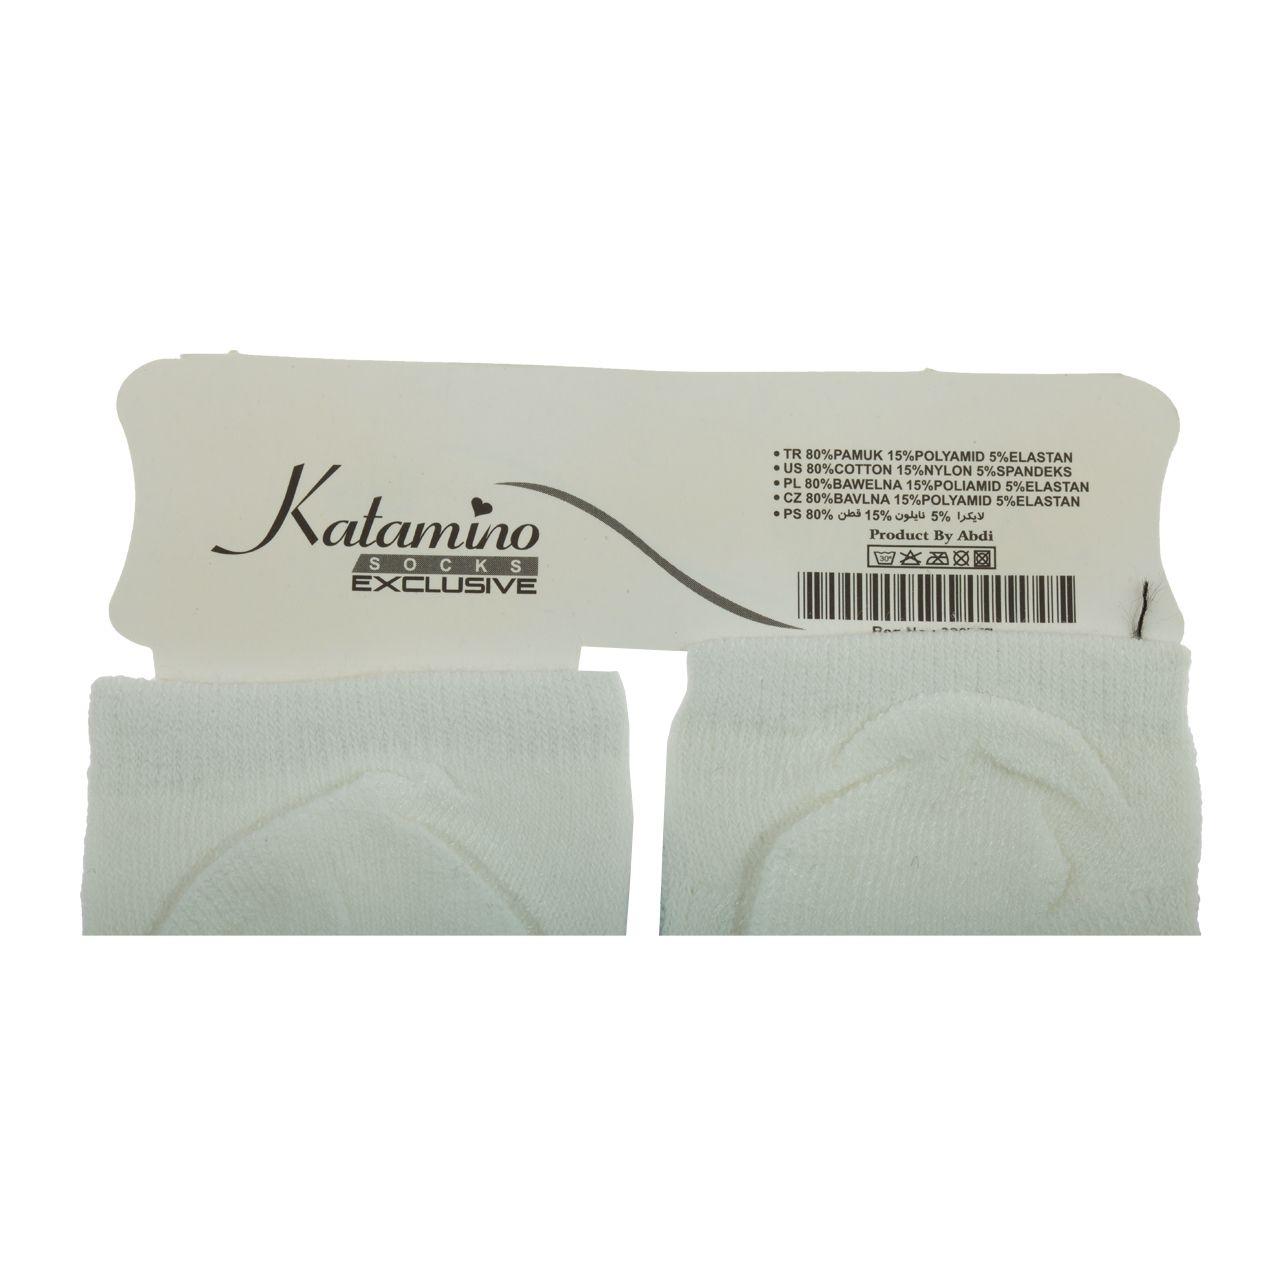 جوراب پسرانه کاتامینو طرح کوکو مدل هکتور -  - 4